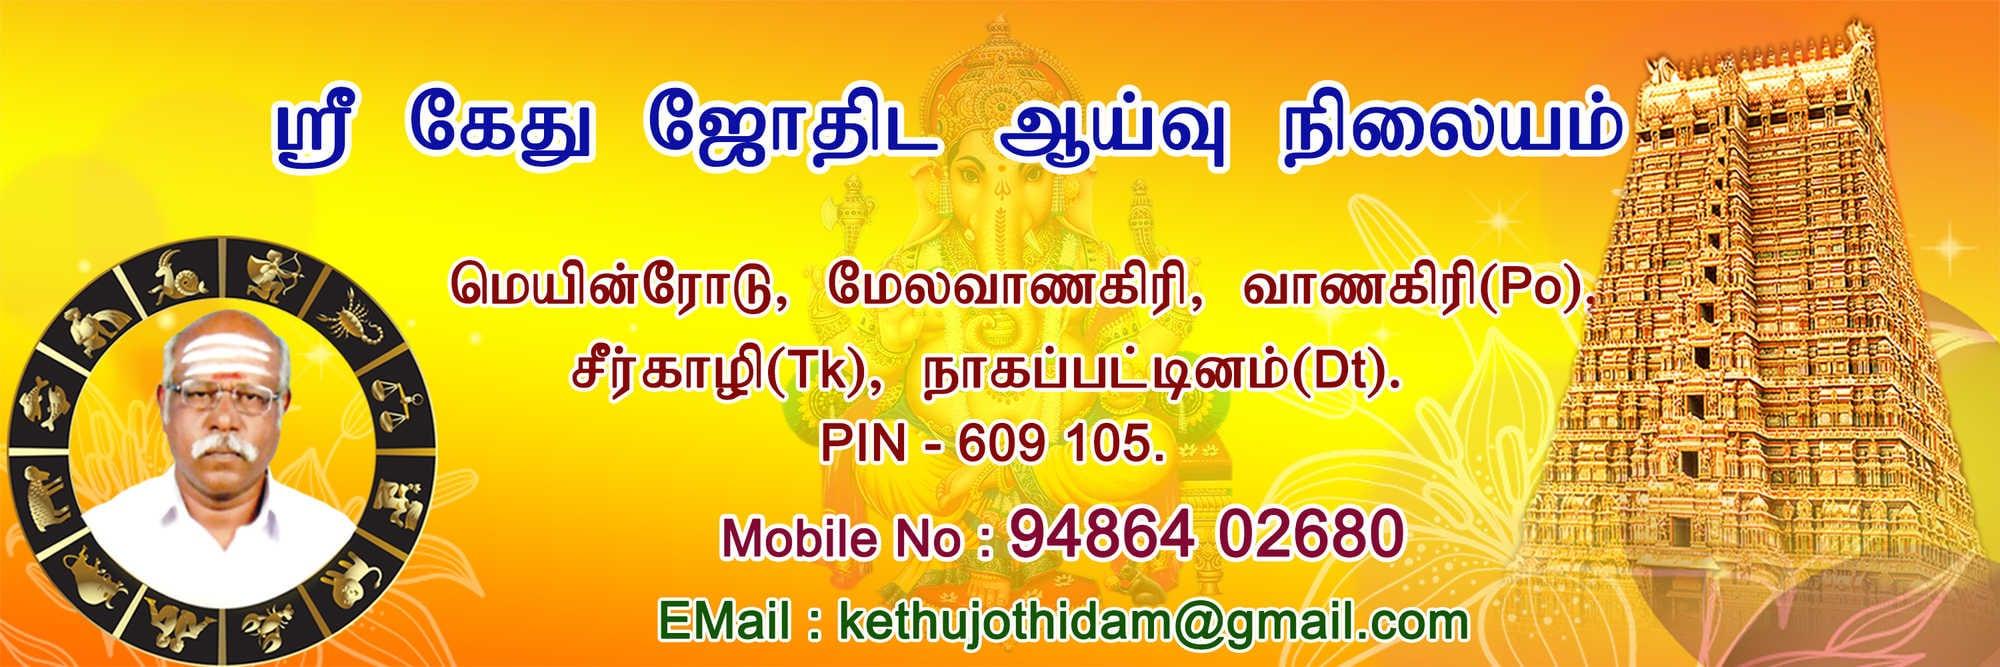 Pincode of POOSAMUTHU NADI JOTHIDAM VAITHISWARANKOIL SIRKALI NAGAPATTINAM TAMIL NADU 609117